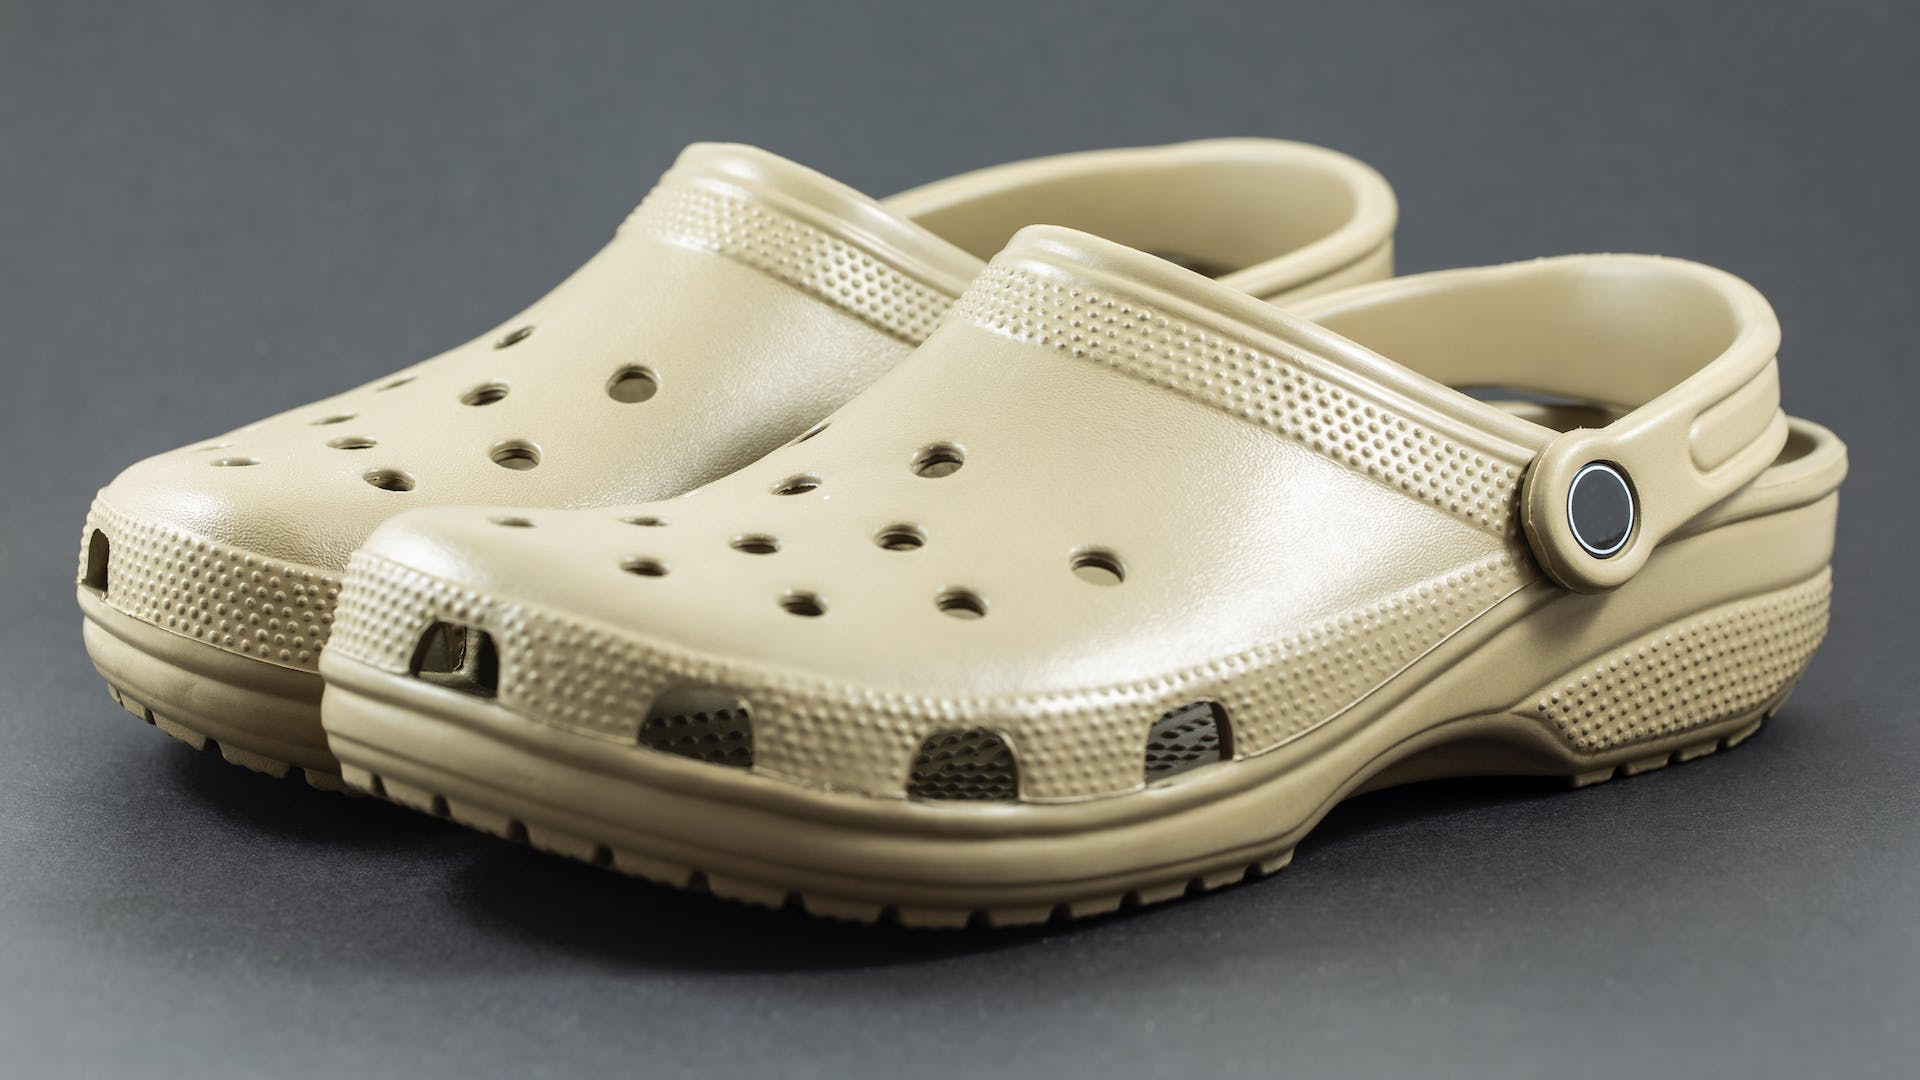 A pairo of Crocs